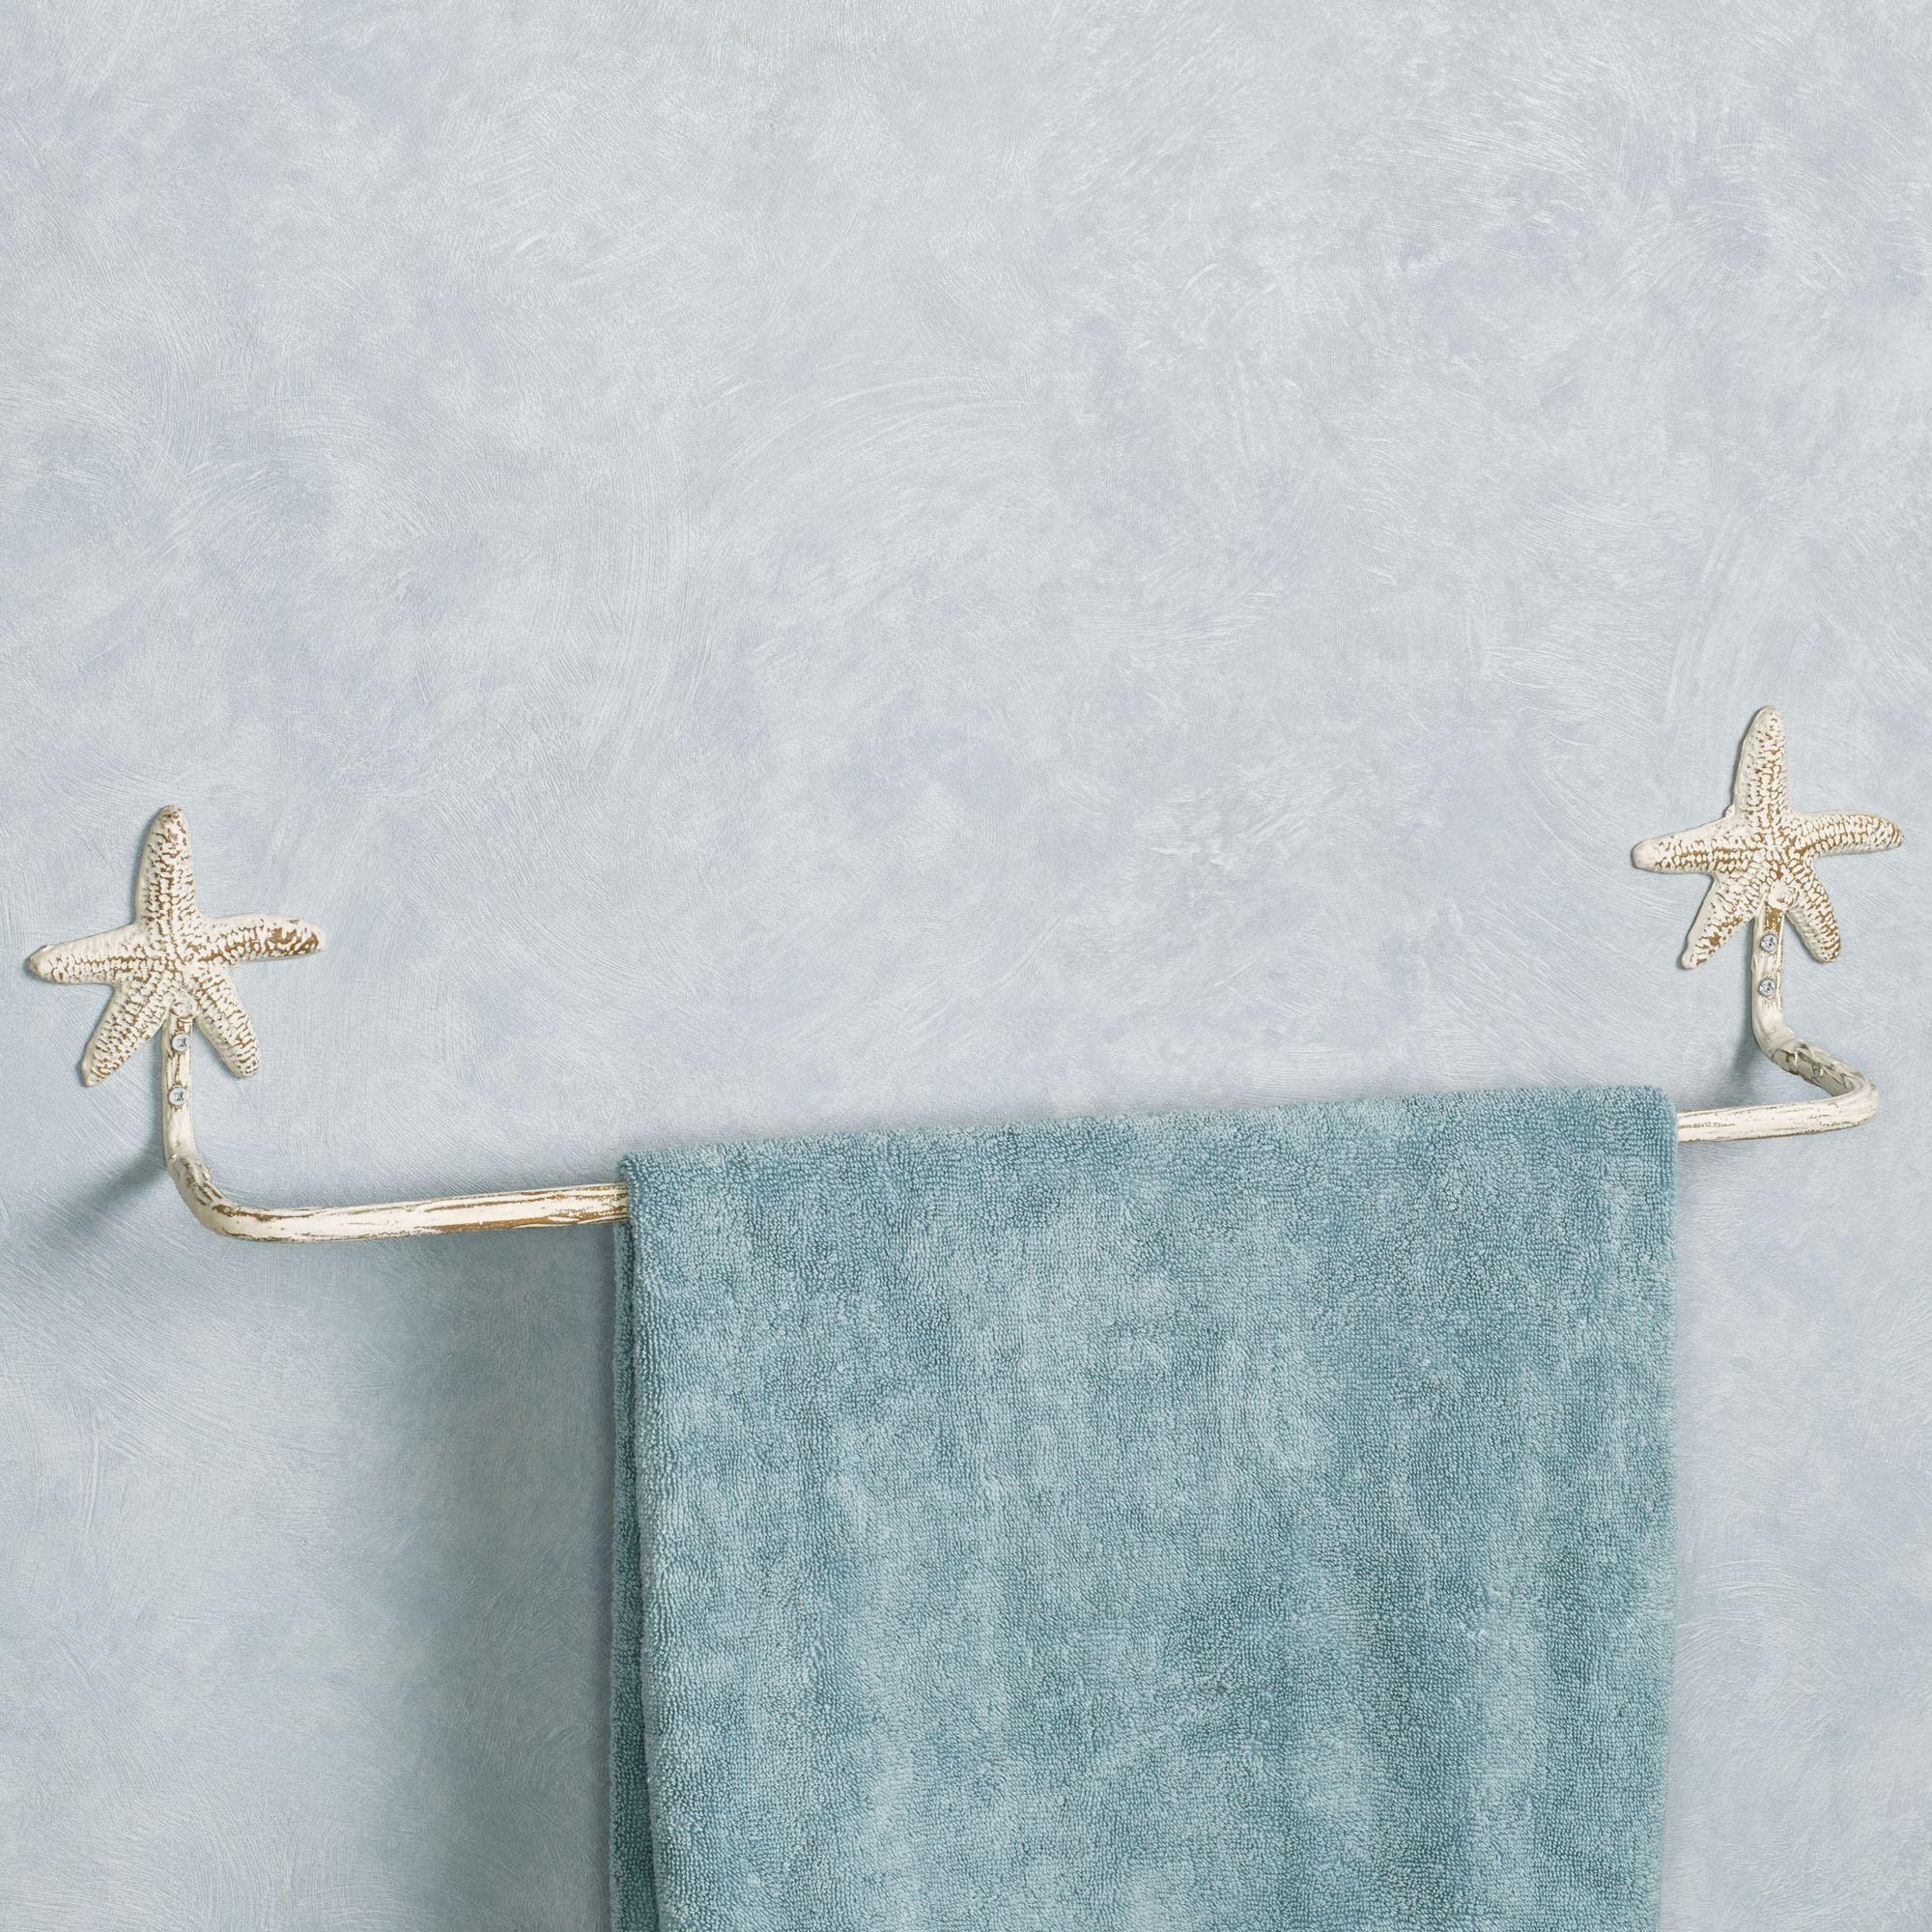 Starfish Coastal Bath Wall Accents